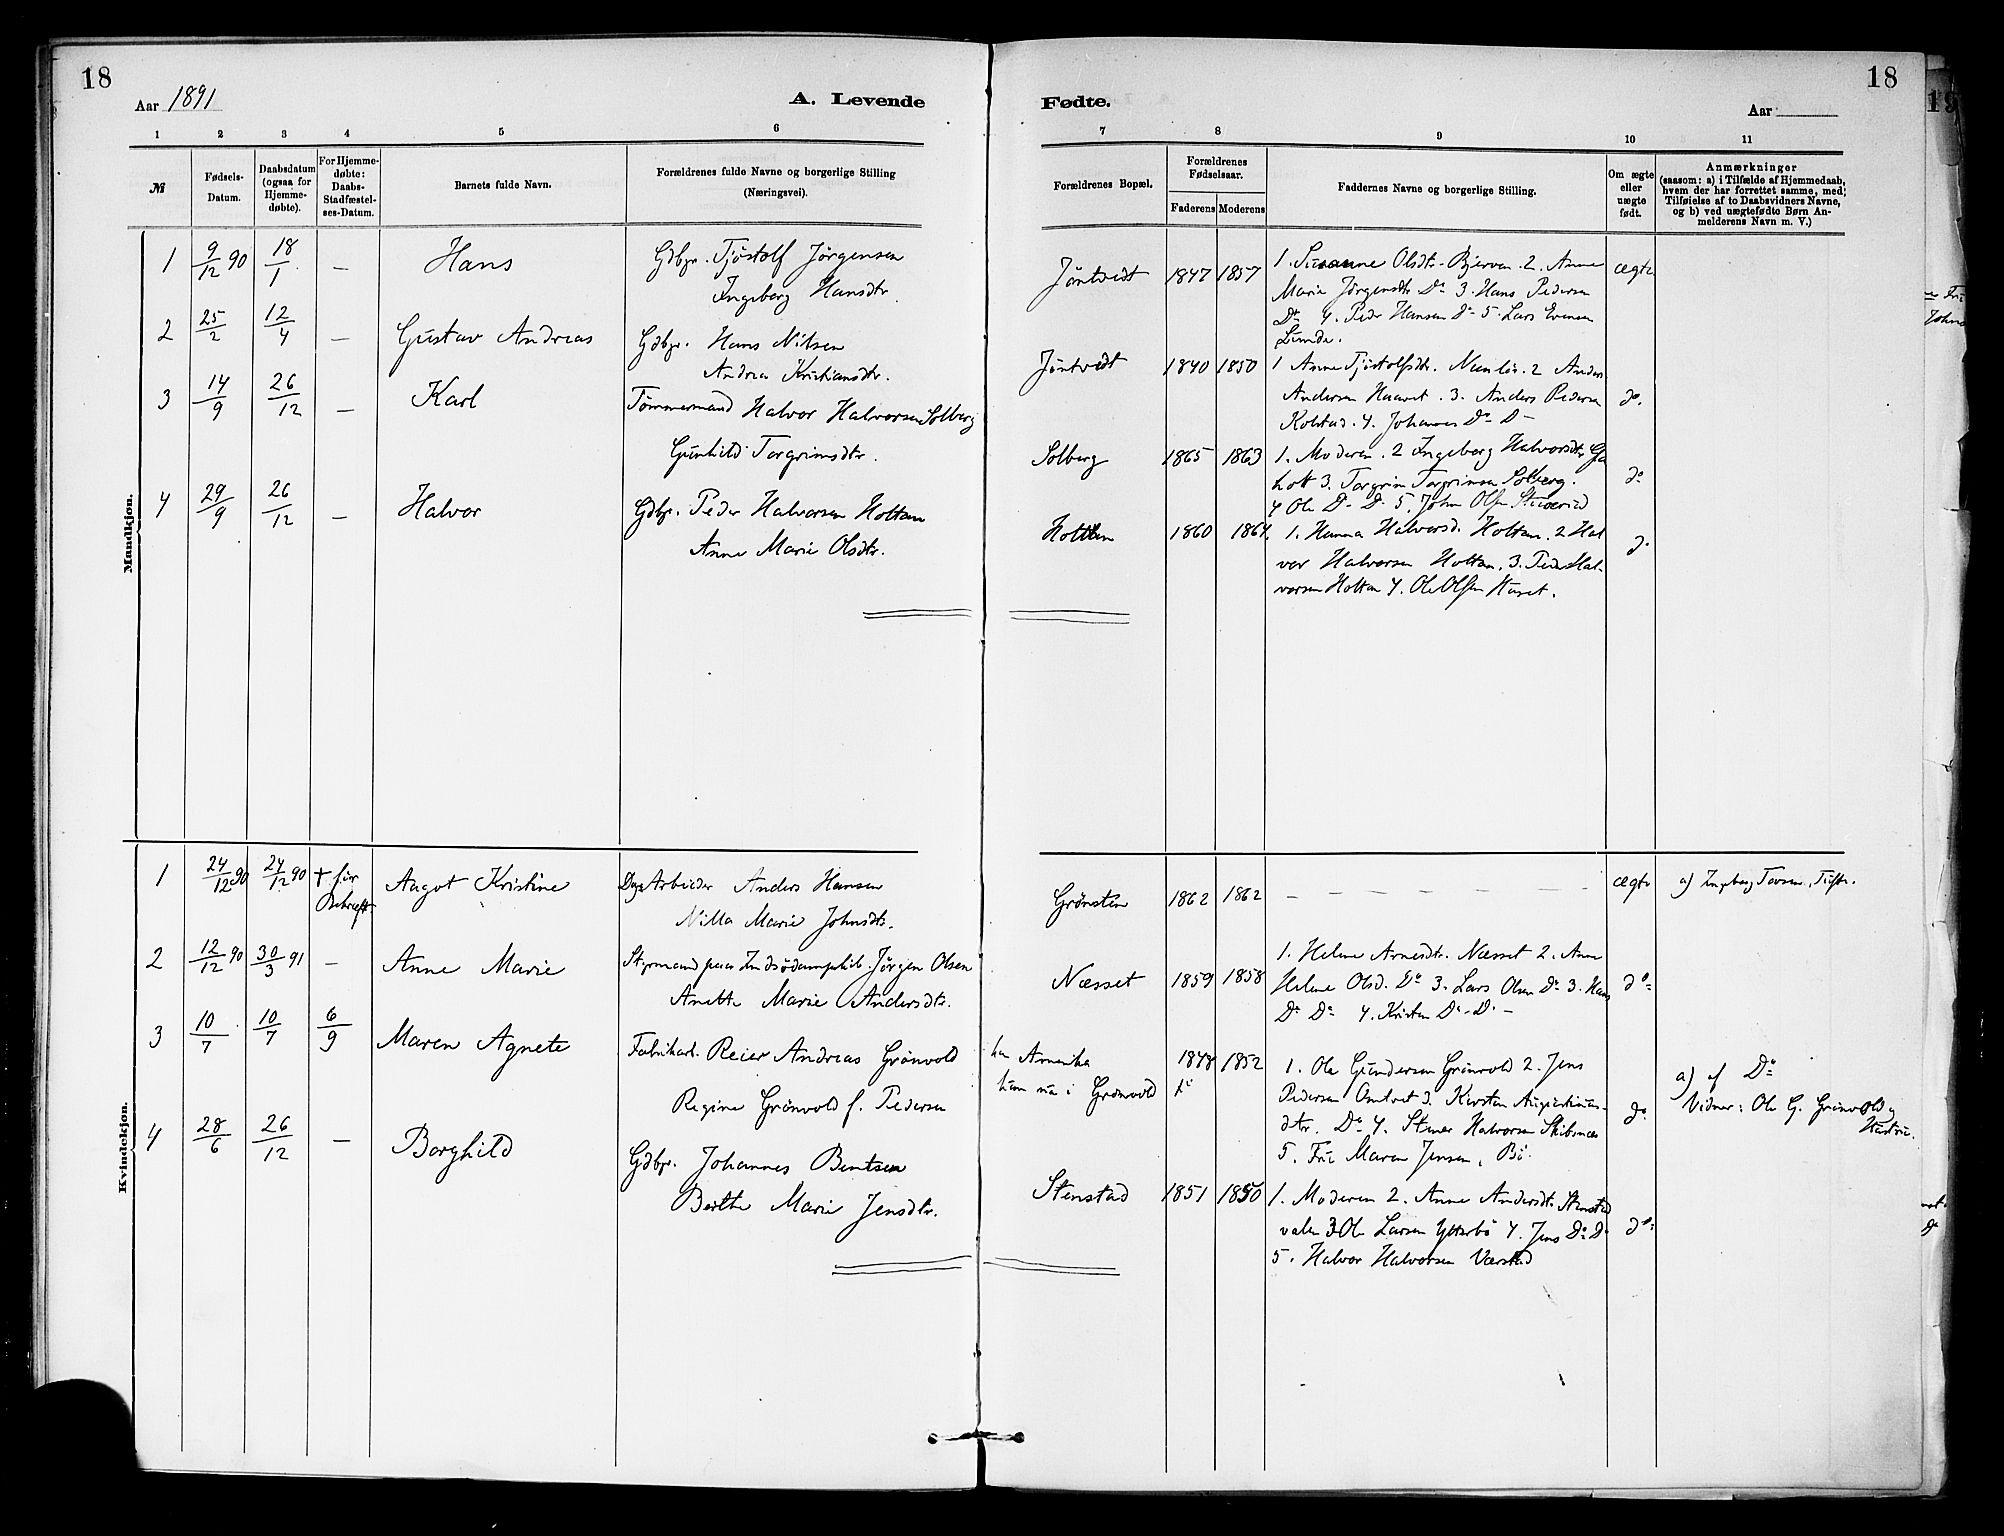 SAKO, Holla kirkebøker, F/Fa/L0009: Ministerialbok nr. 9, 1881-1897, s. 18